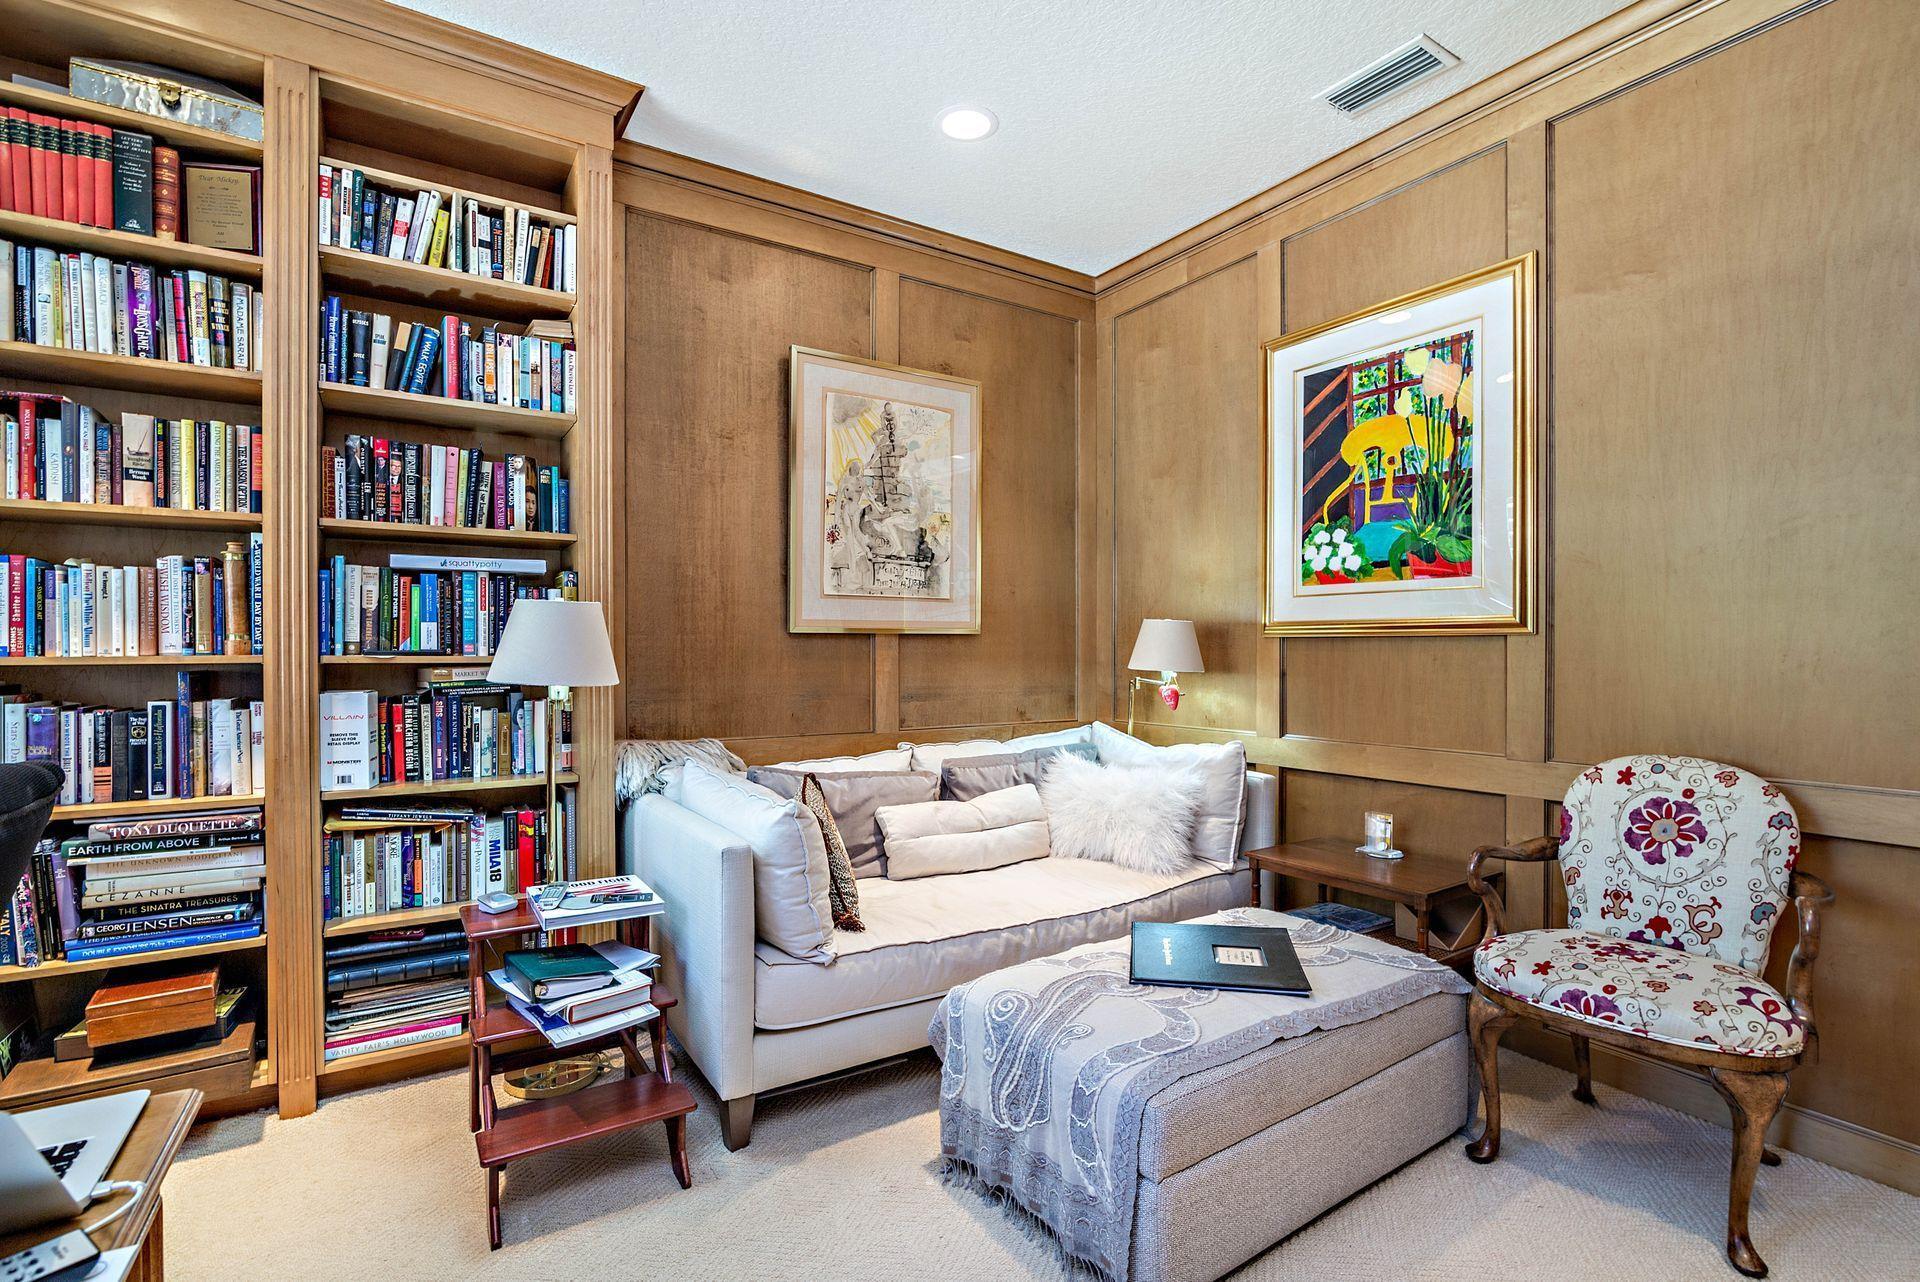 13590 Verde Drive, Palm Beach Gardens, Florida 33410, 4 Bedrooms Bedrooms, ,4.1 BathroomsBathrooms,A,Single family,Verde,RX-10467245